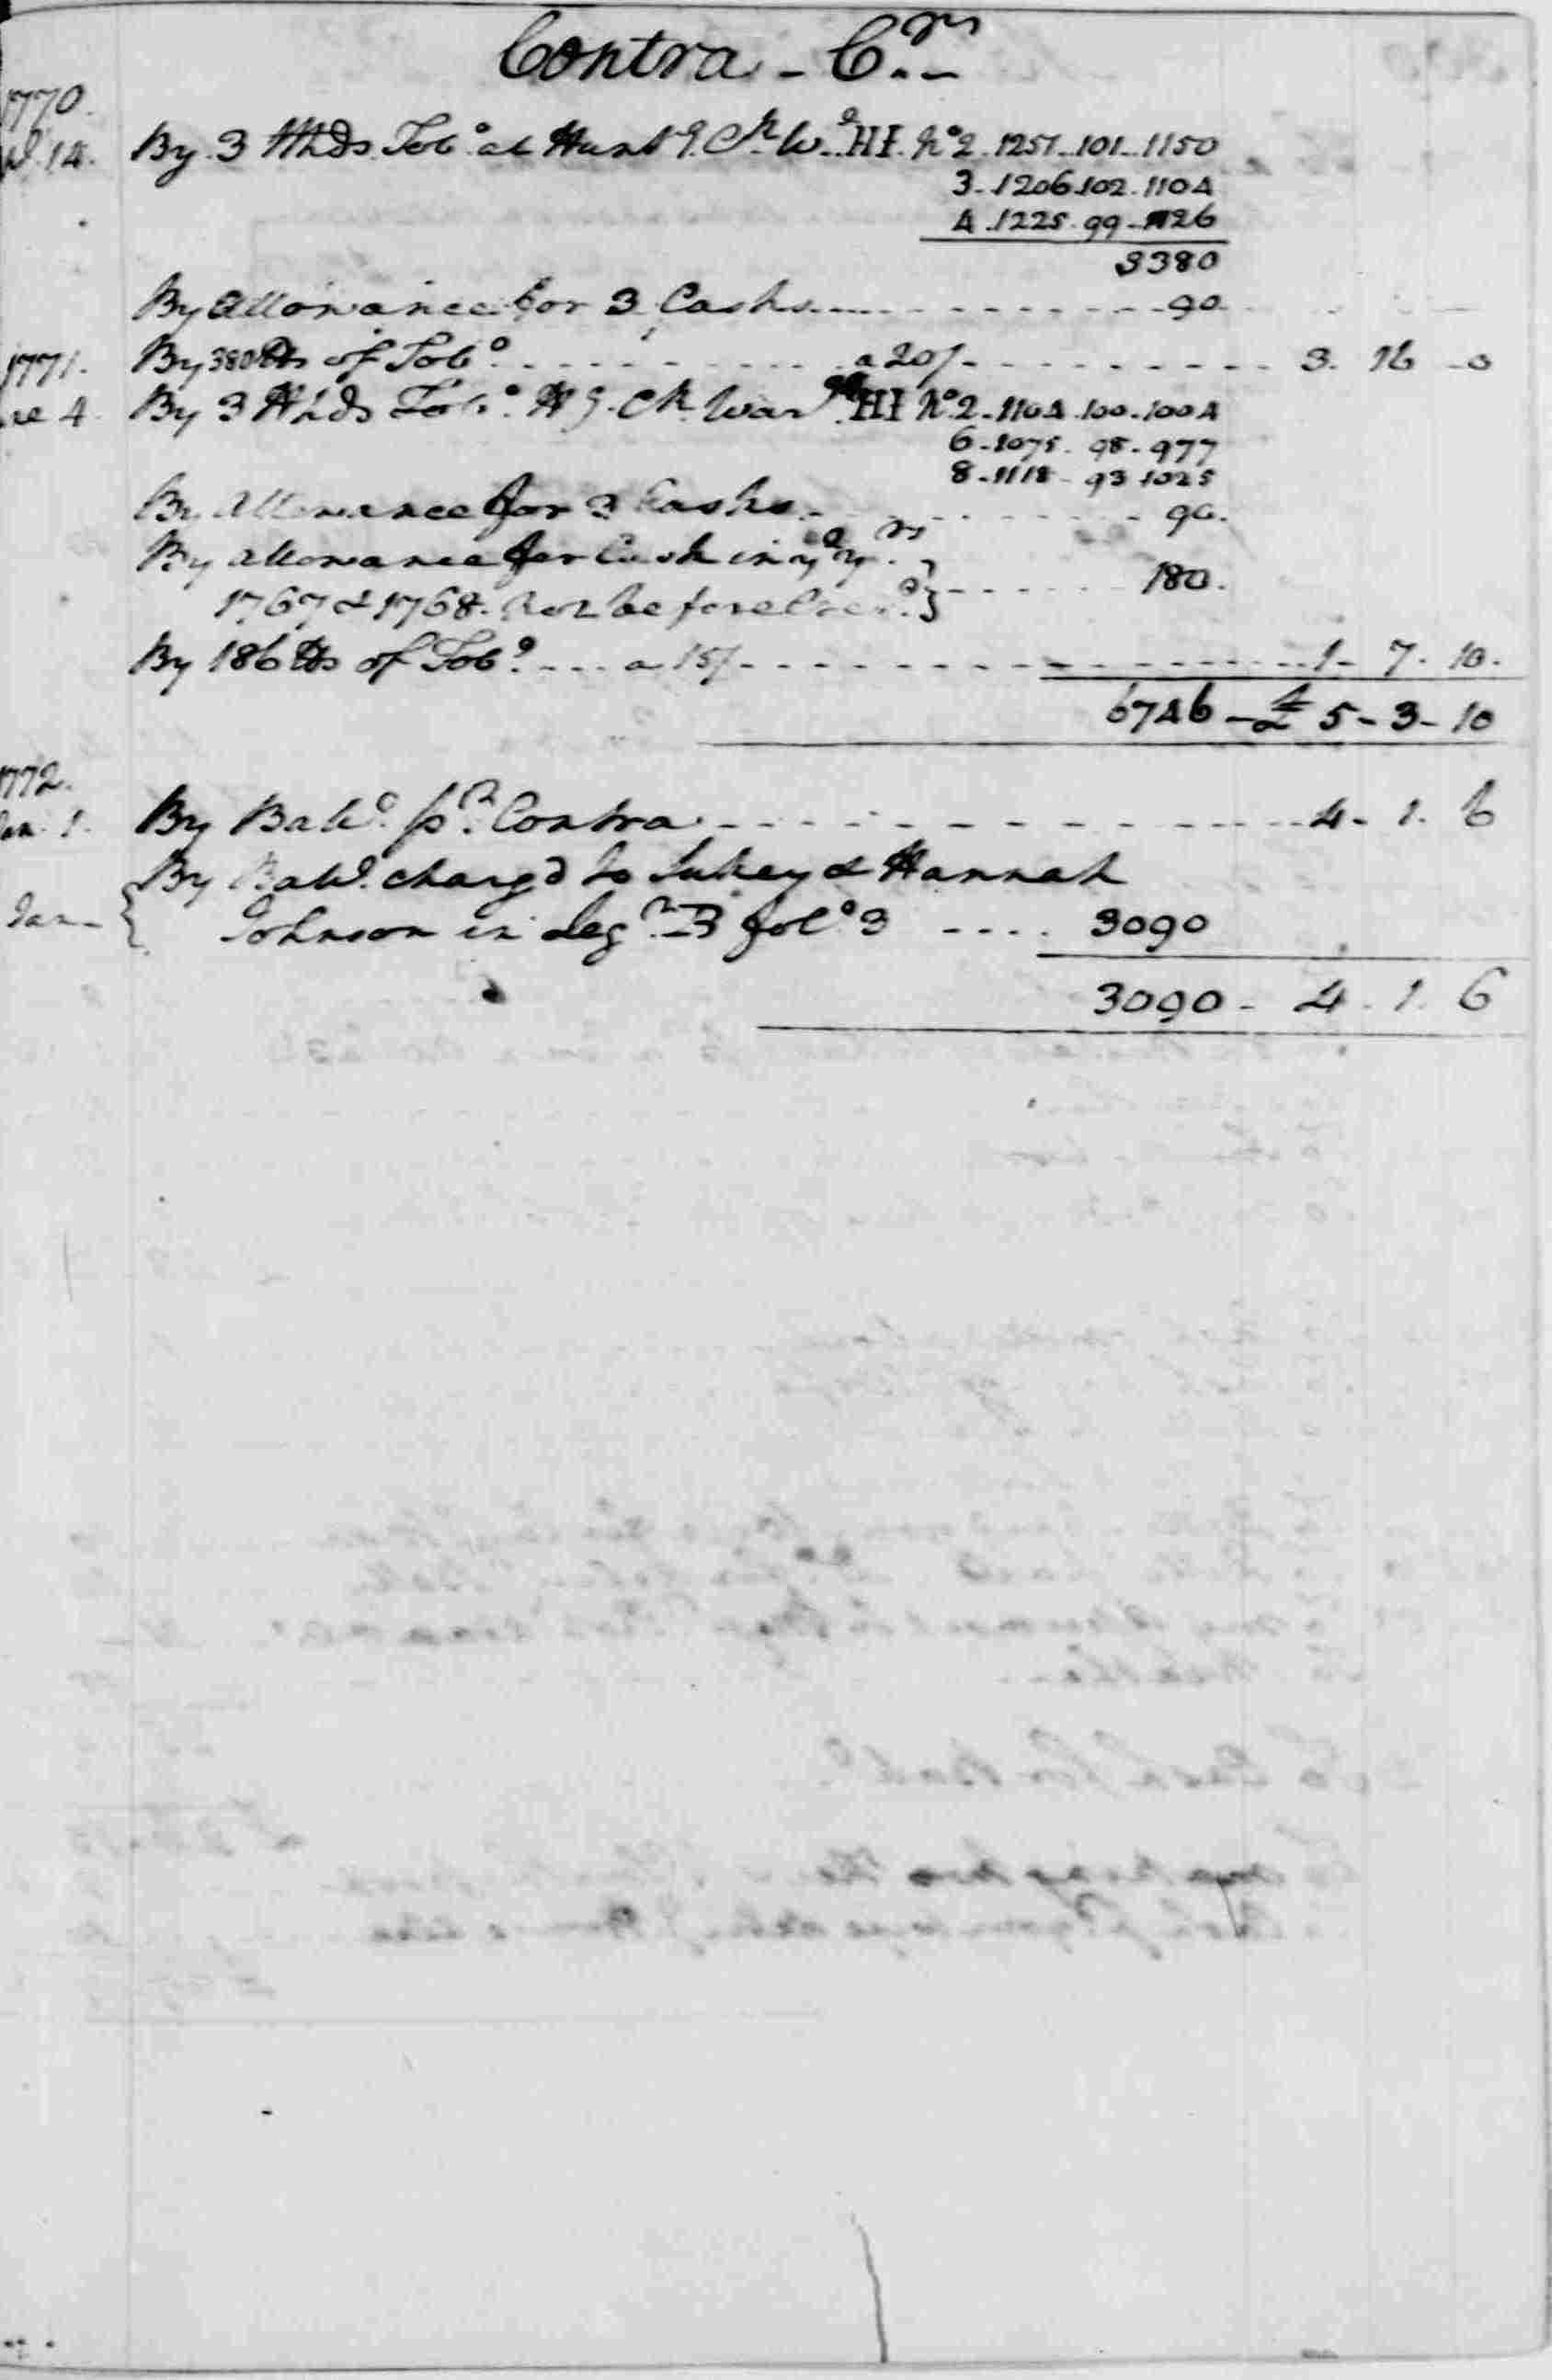 Ledger A, folio 308, right side